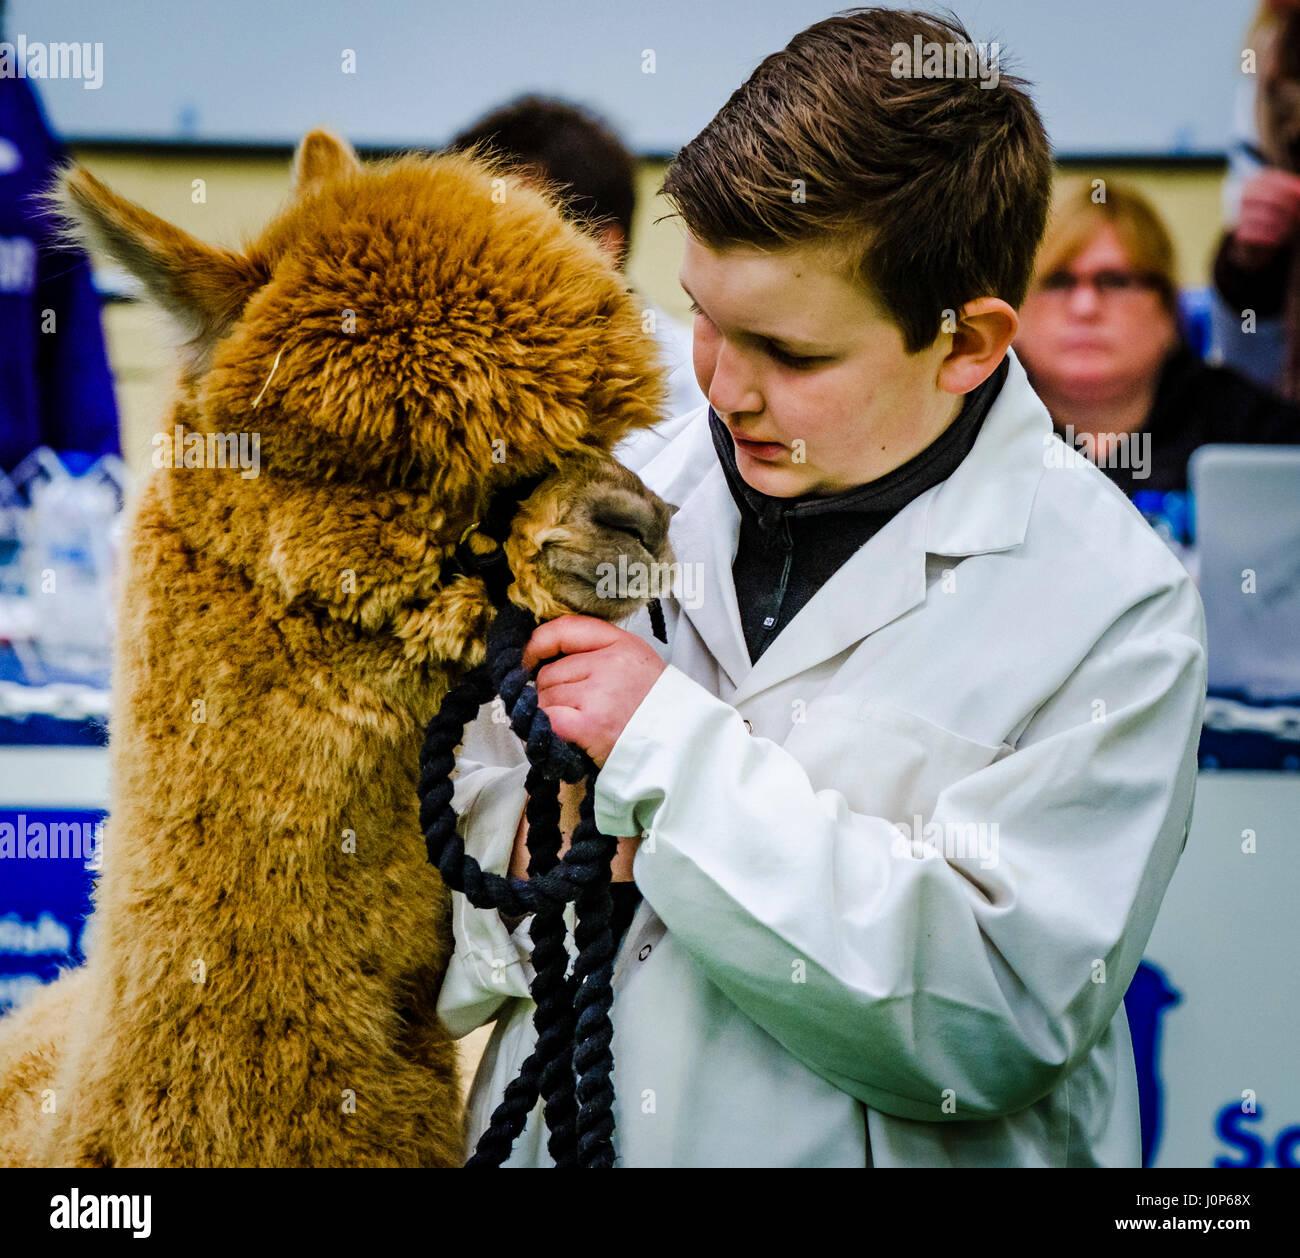 Lanark Scotland 15th April 2017:  The Second Scottish Alpaca Championship, organised by the Scottish Alpaca Group, - Stock Image